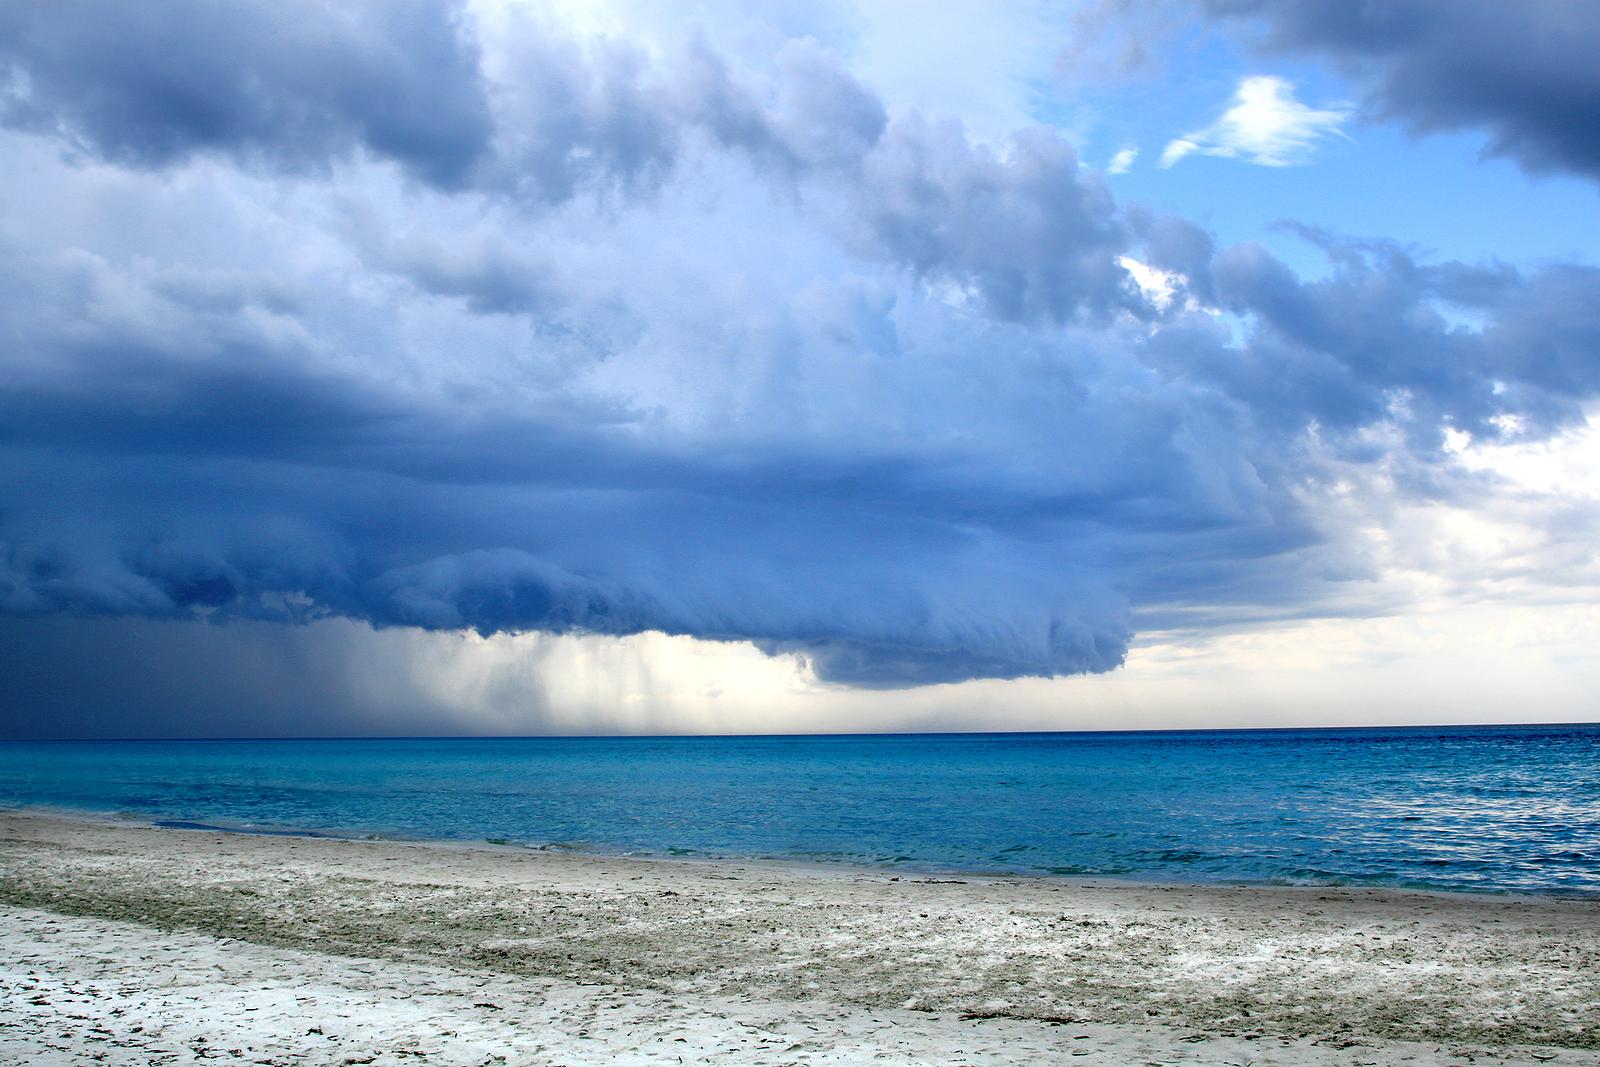 Ocean Sea Weather Clouds Rain Storm Wallpaper 1600x1067